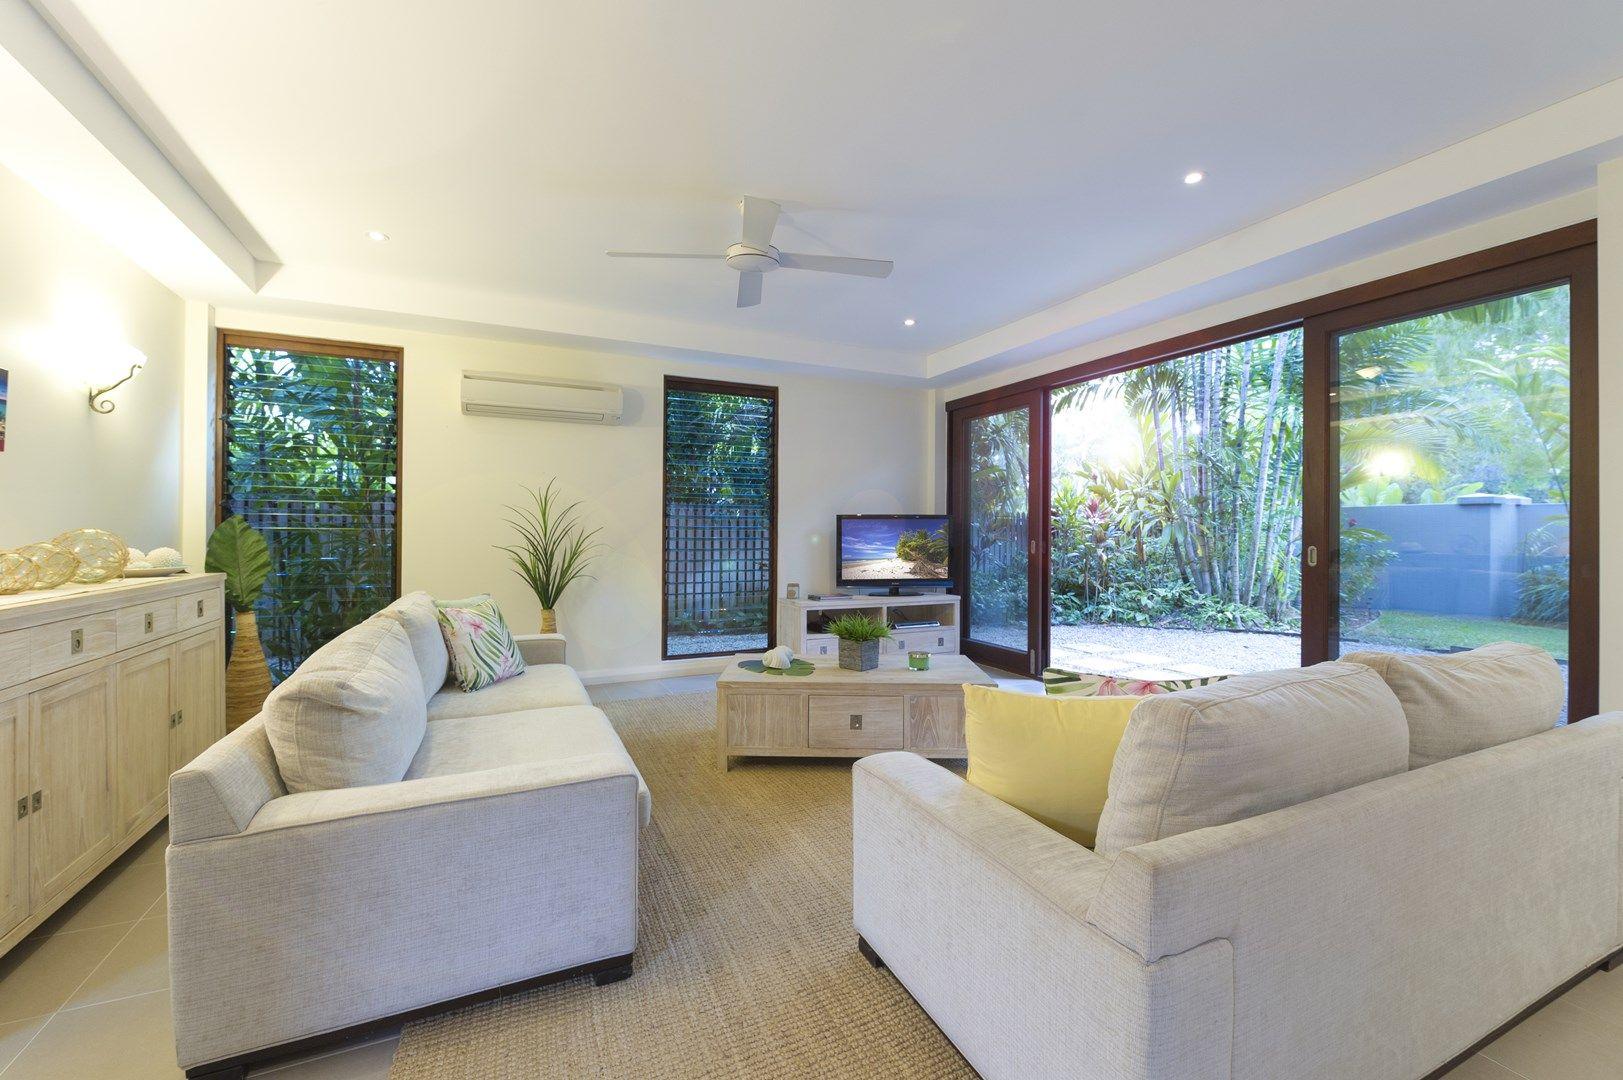 2/42 Garrick Street, Port Douglas QLD 4877, Image 1